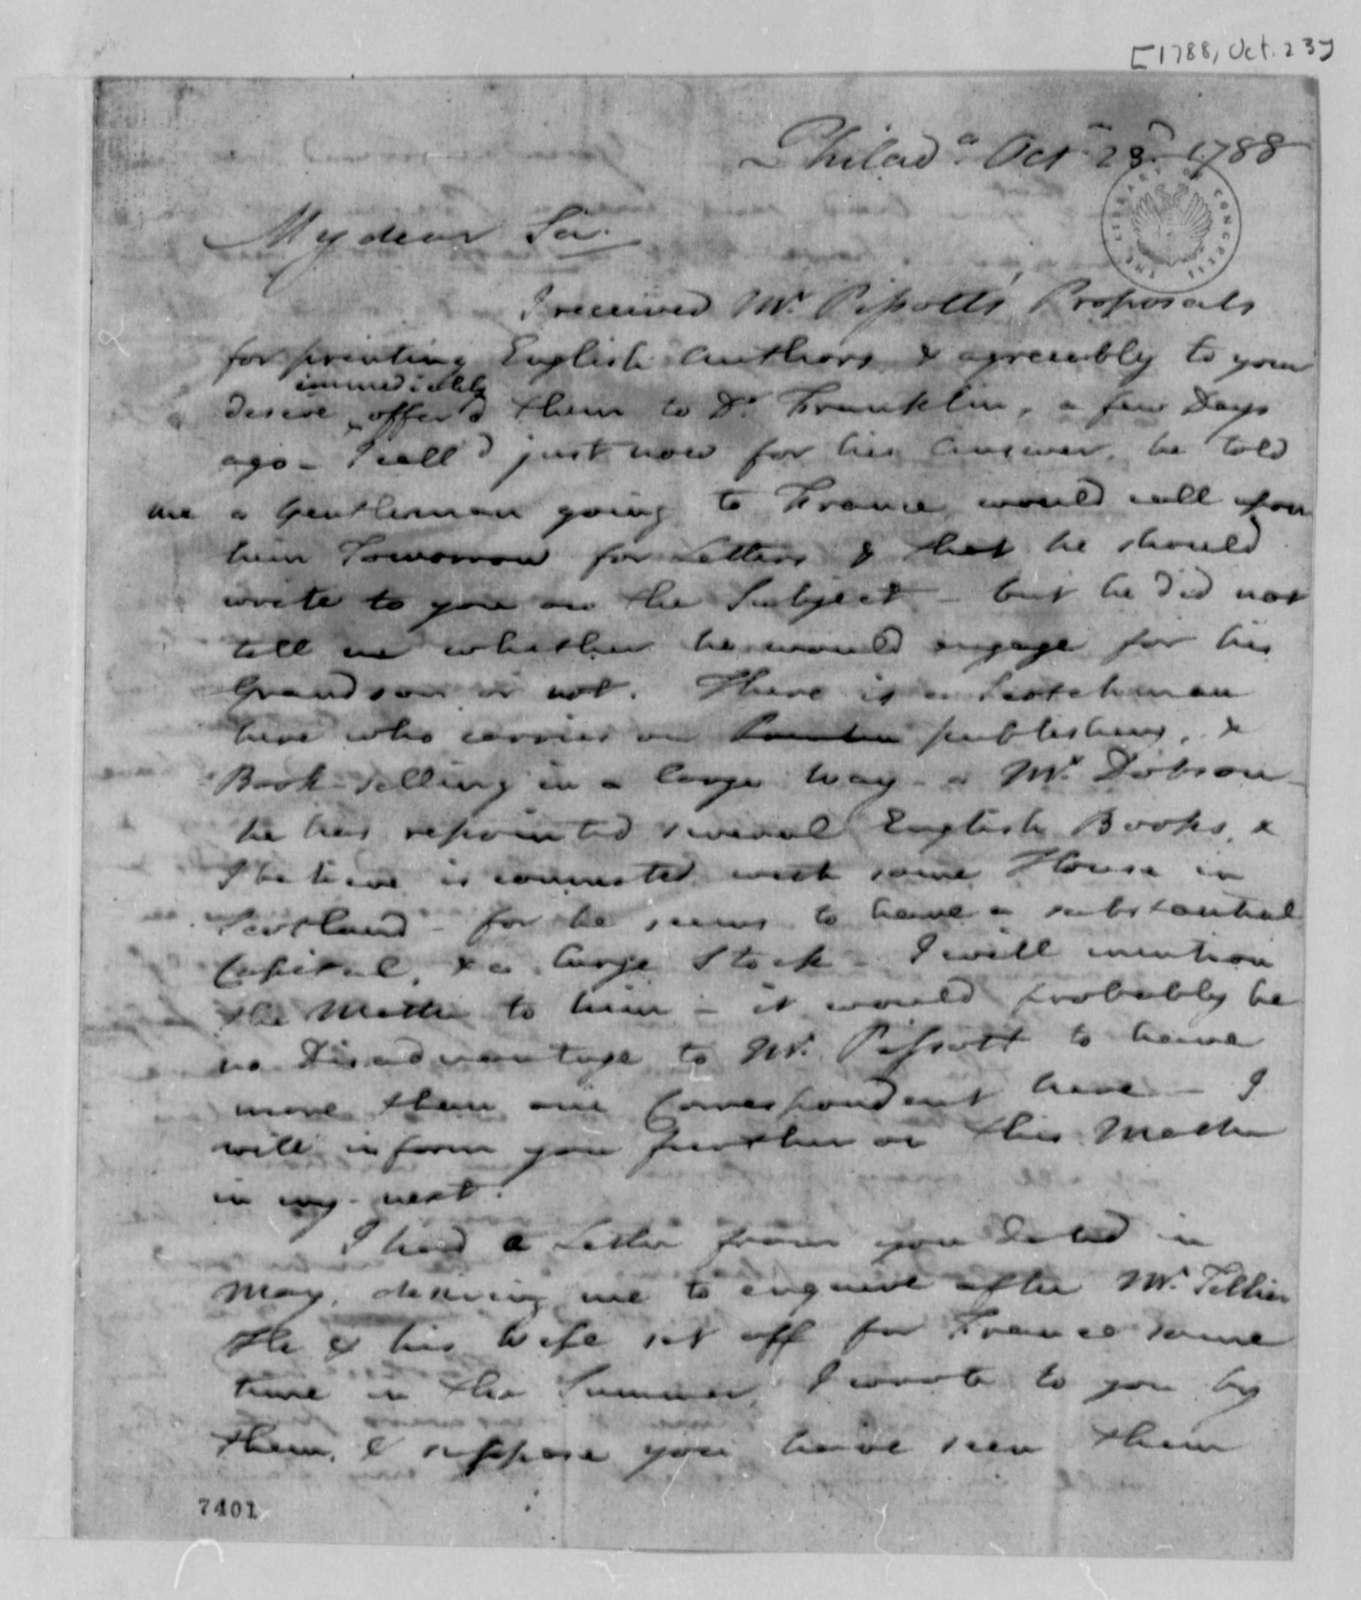 Francis Hopkinson to Thomas Jefferson, October 23, 1788